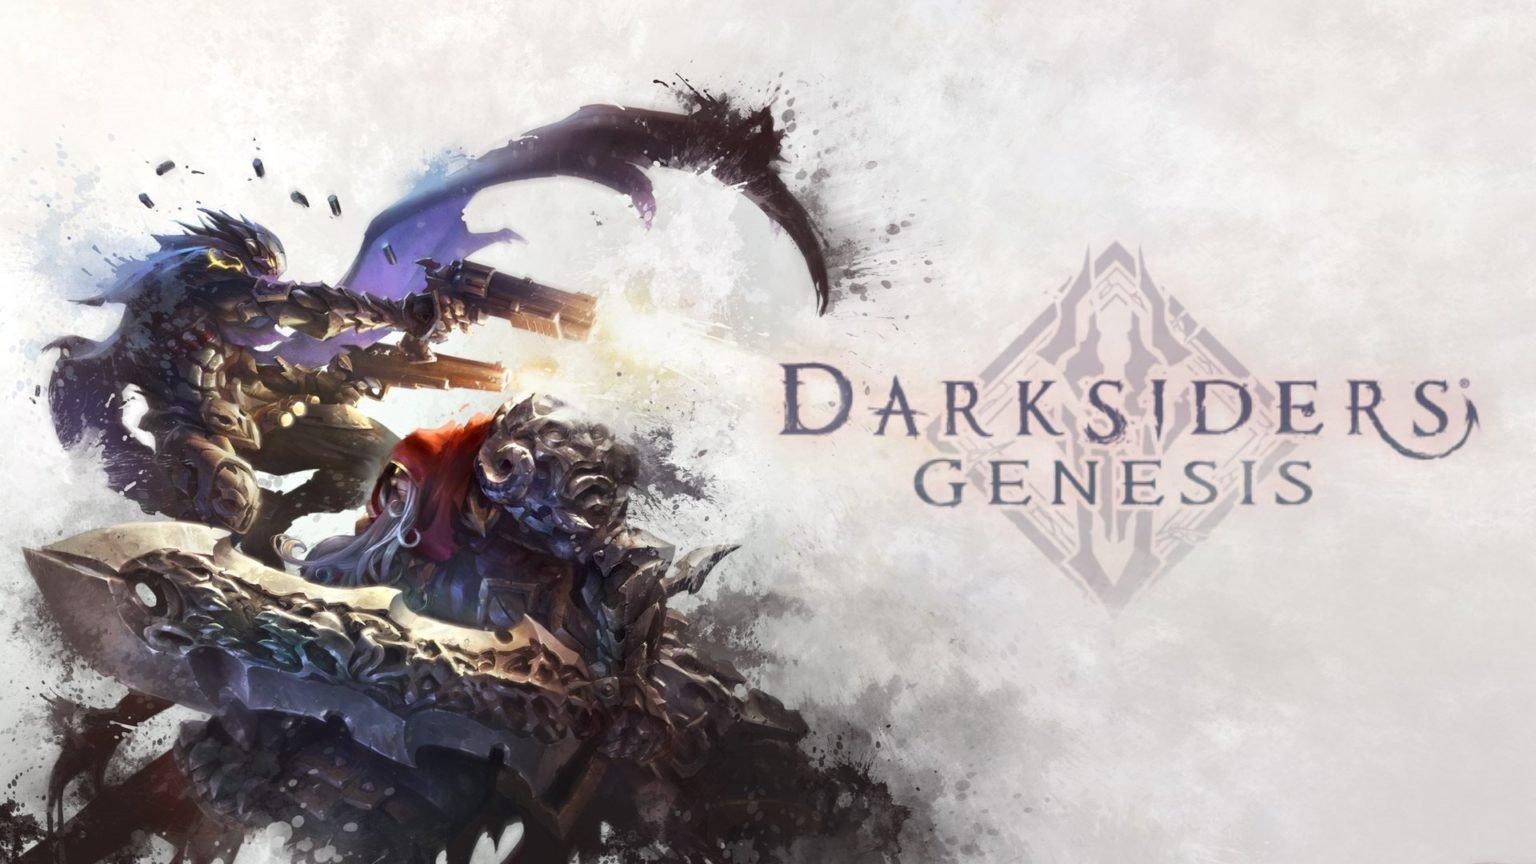 Darksiders Genesis PC Version Full Game Free Download